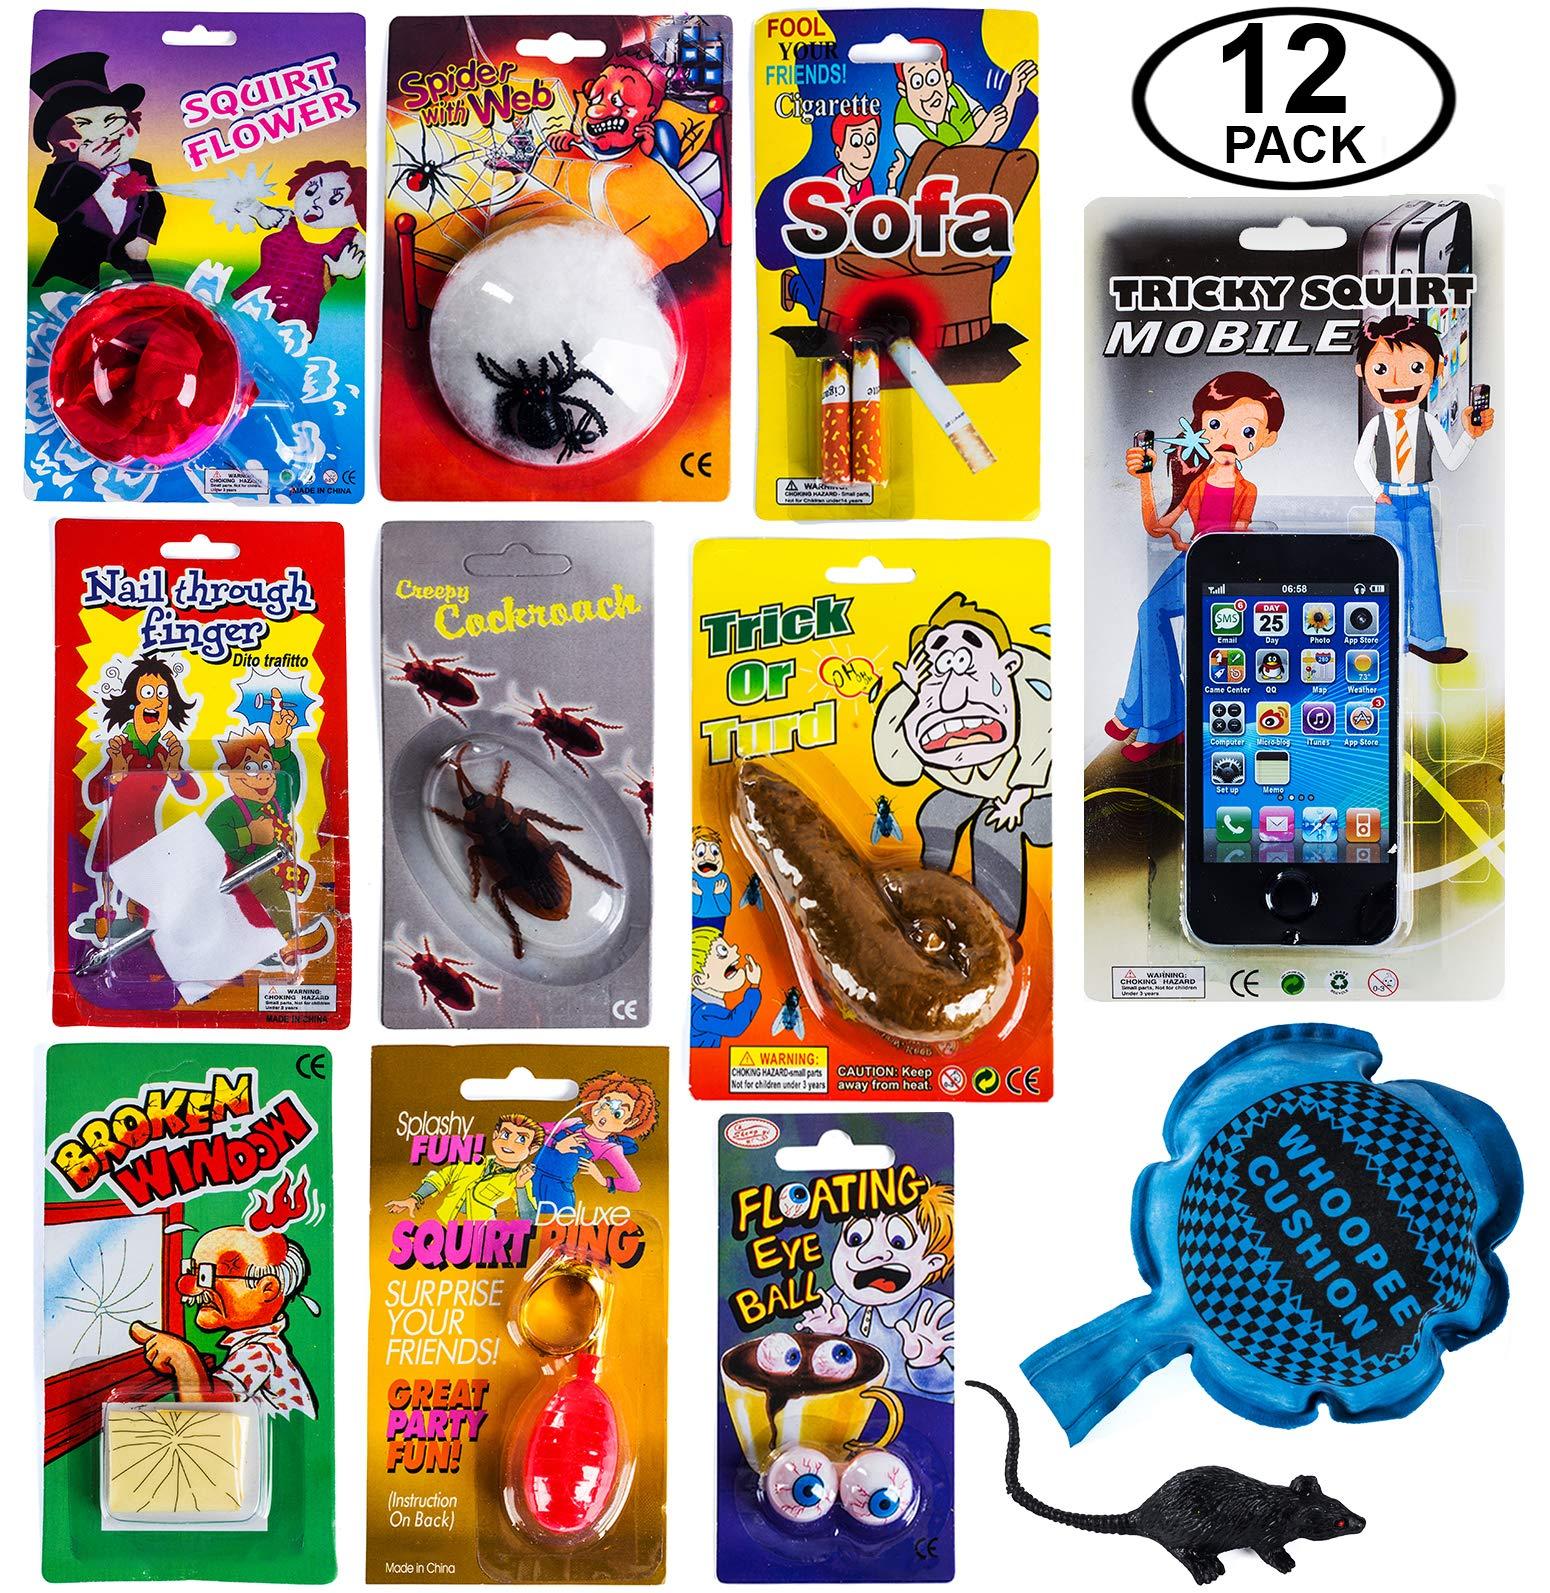 Tigerdoe Pranks & Gag Set - Practical Joke - Gag Gift - Prank Stuff - April Fools Prank Kit - Prankster Kit - 12 Pc